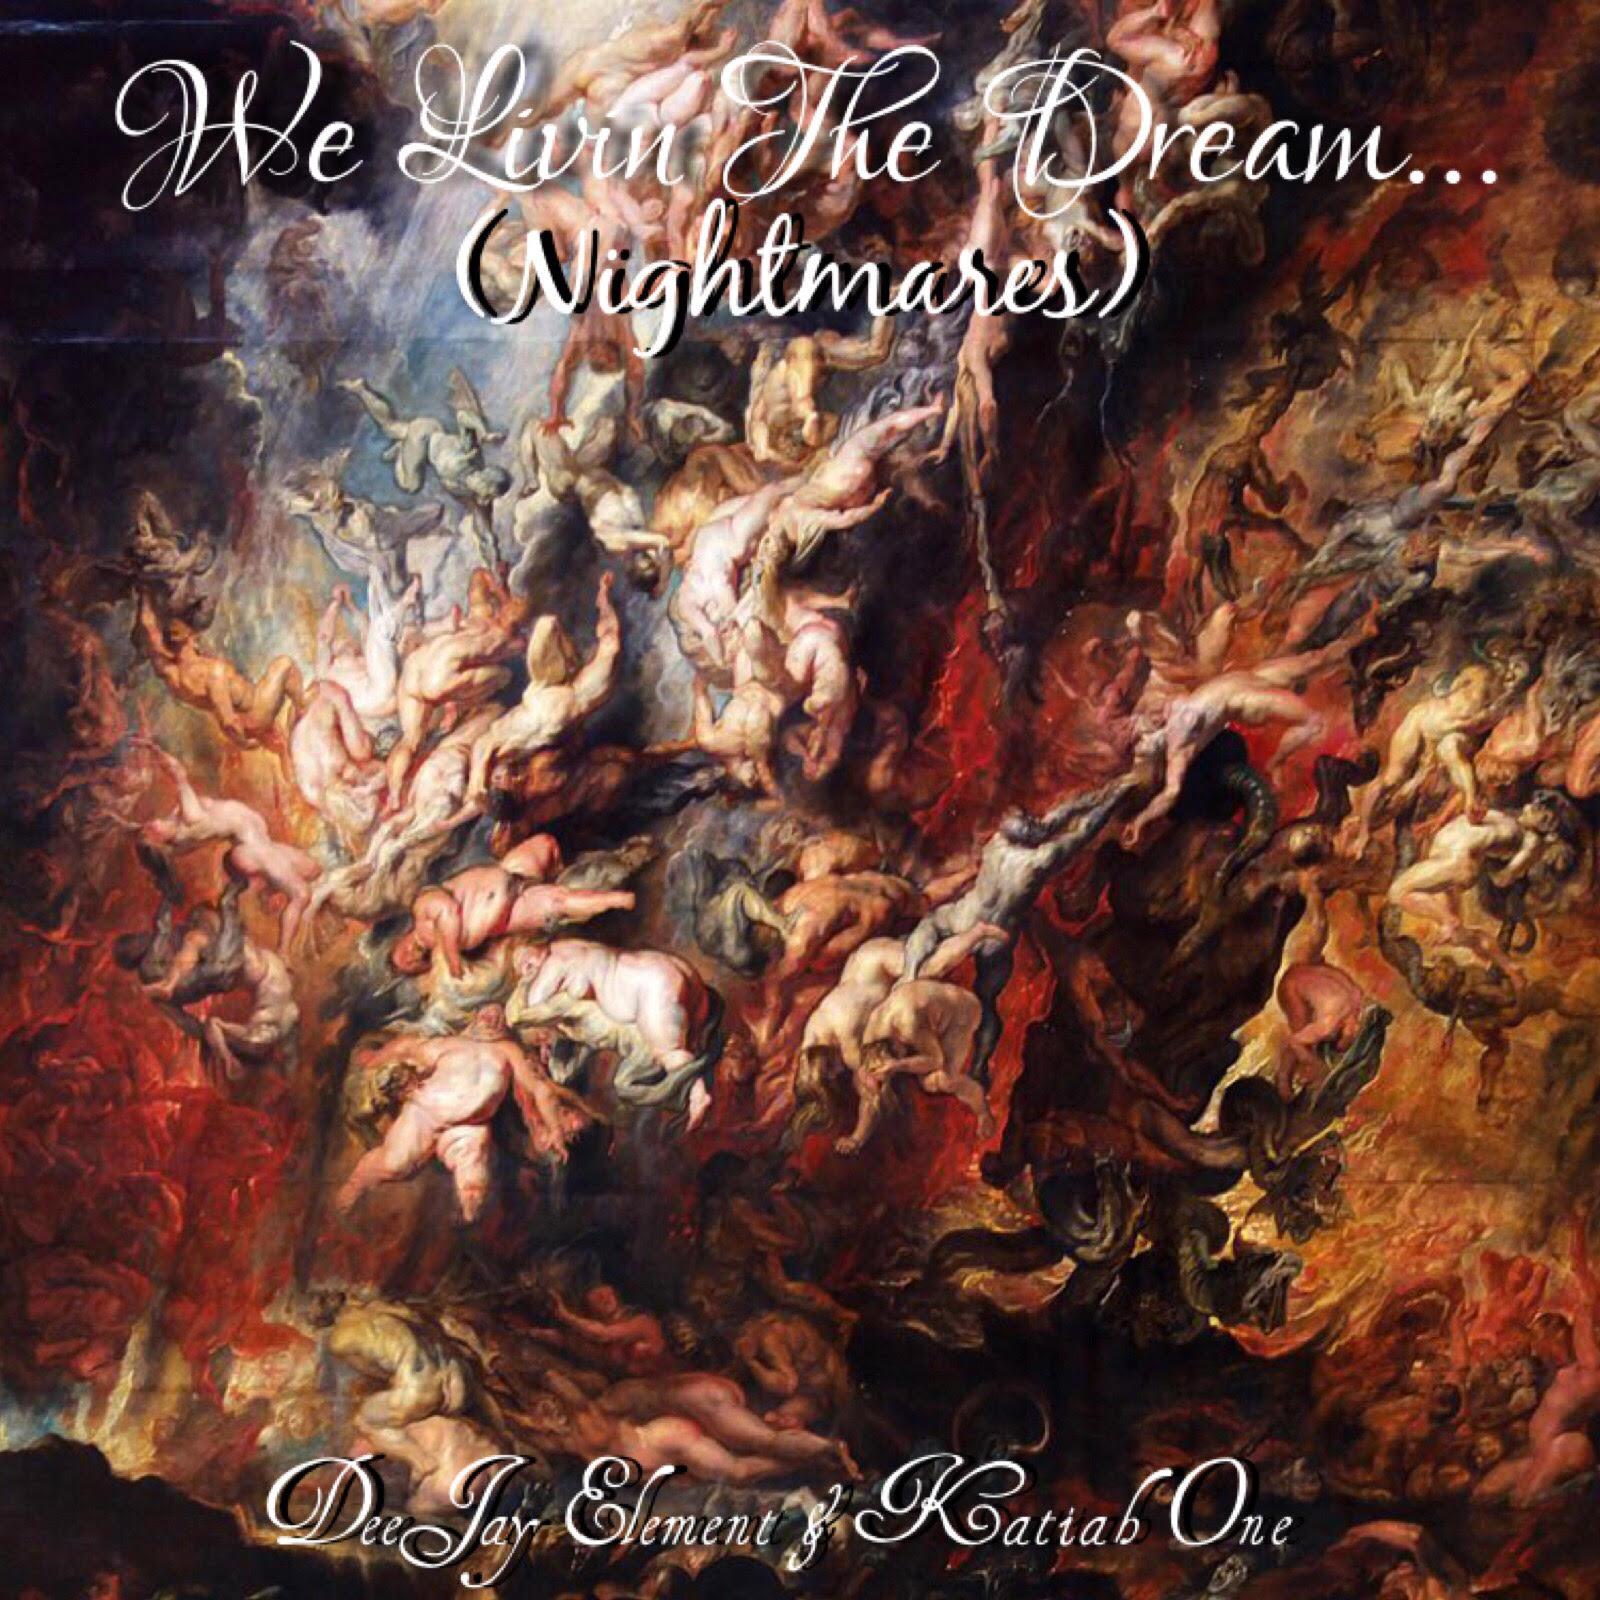 We Livin the Dream (Nightmares) - DeeJay Element & Katiah One